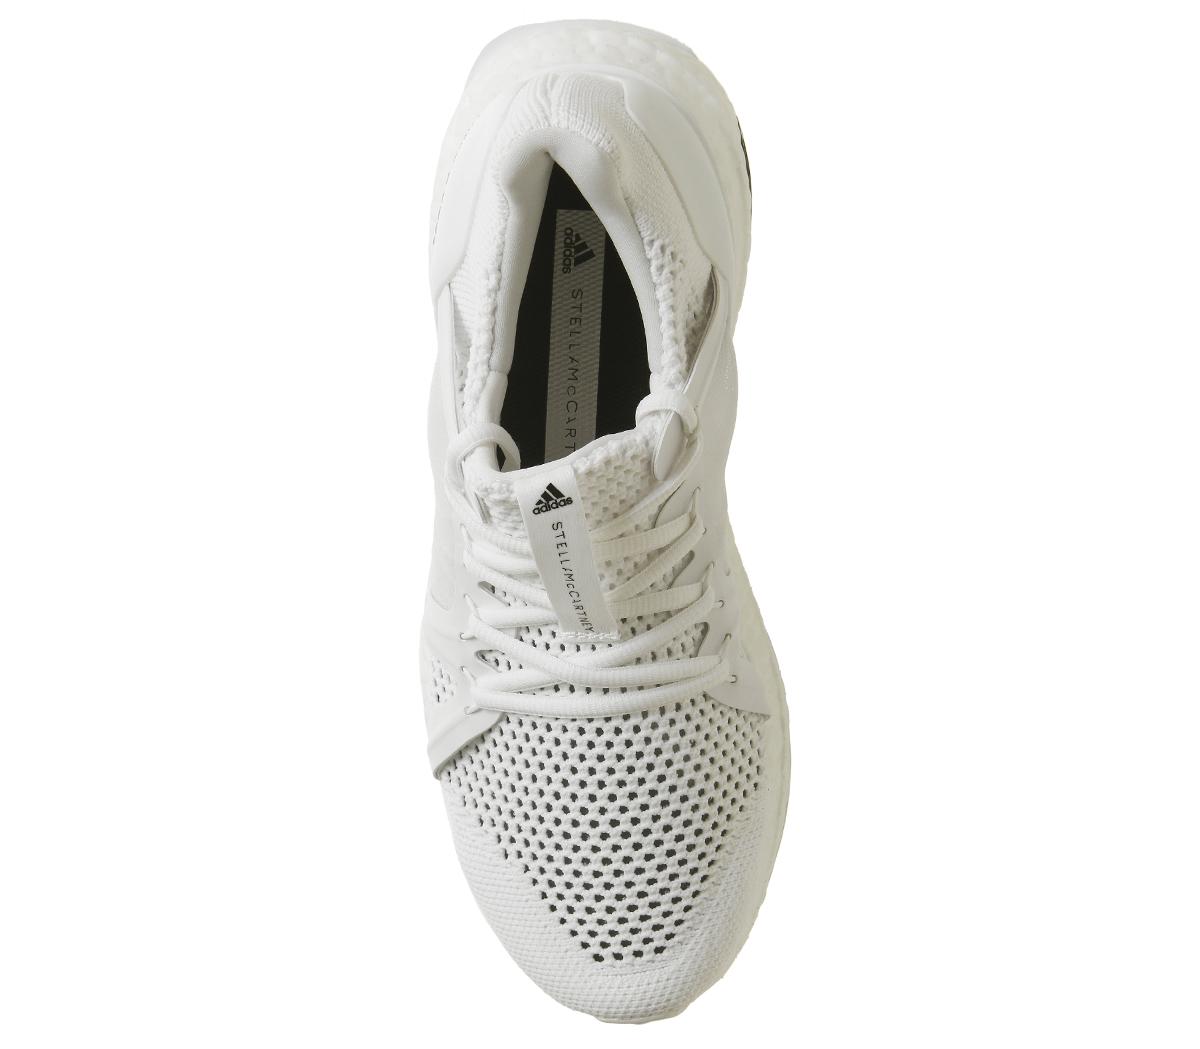 Damenschuhe Adidas Weiß Stella Ultra Boost Trainers Weiß Adidas Trainers Schuhes 27e535